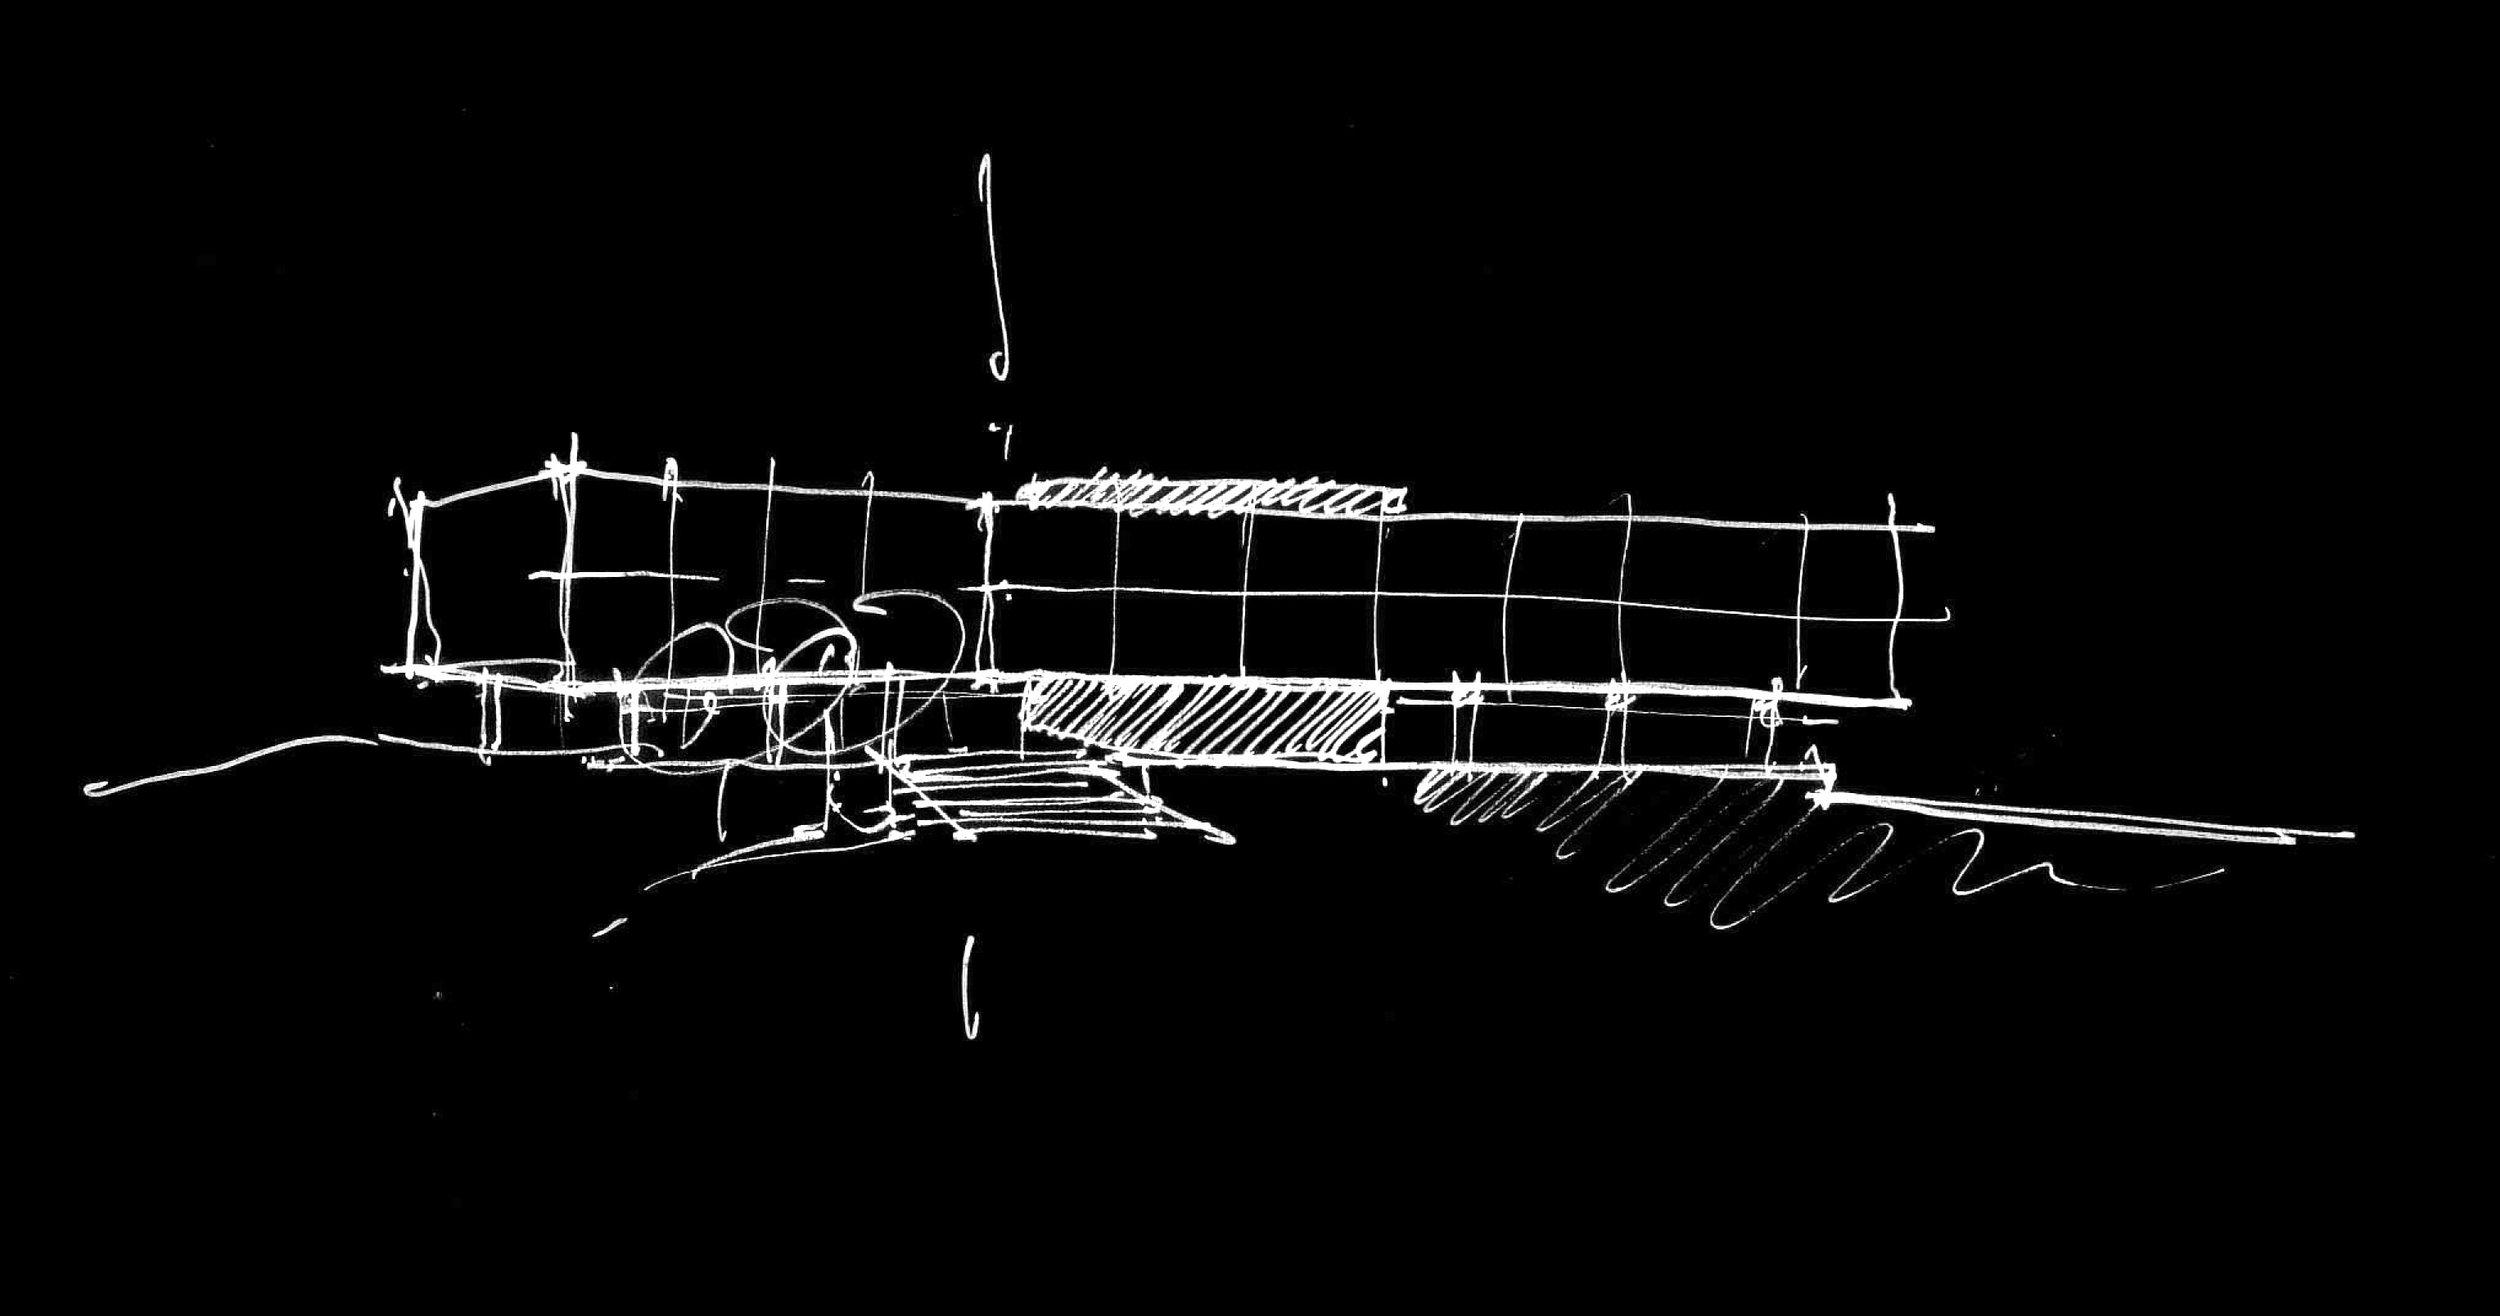 McKinley Burkart_Mark Burkart_Sketch (4)_inverted.jpg